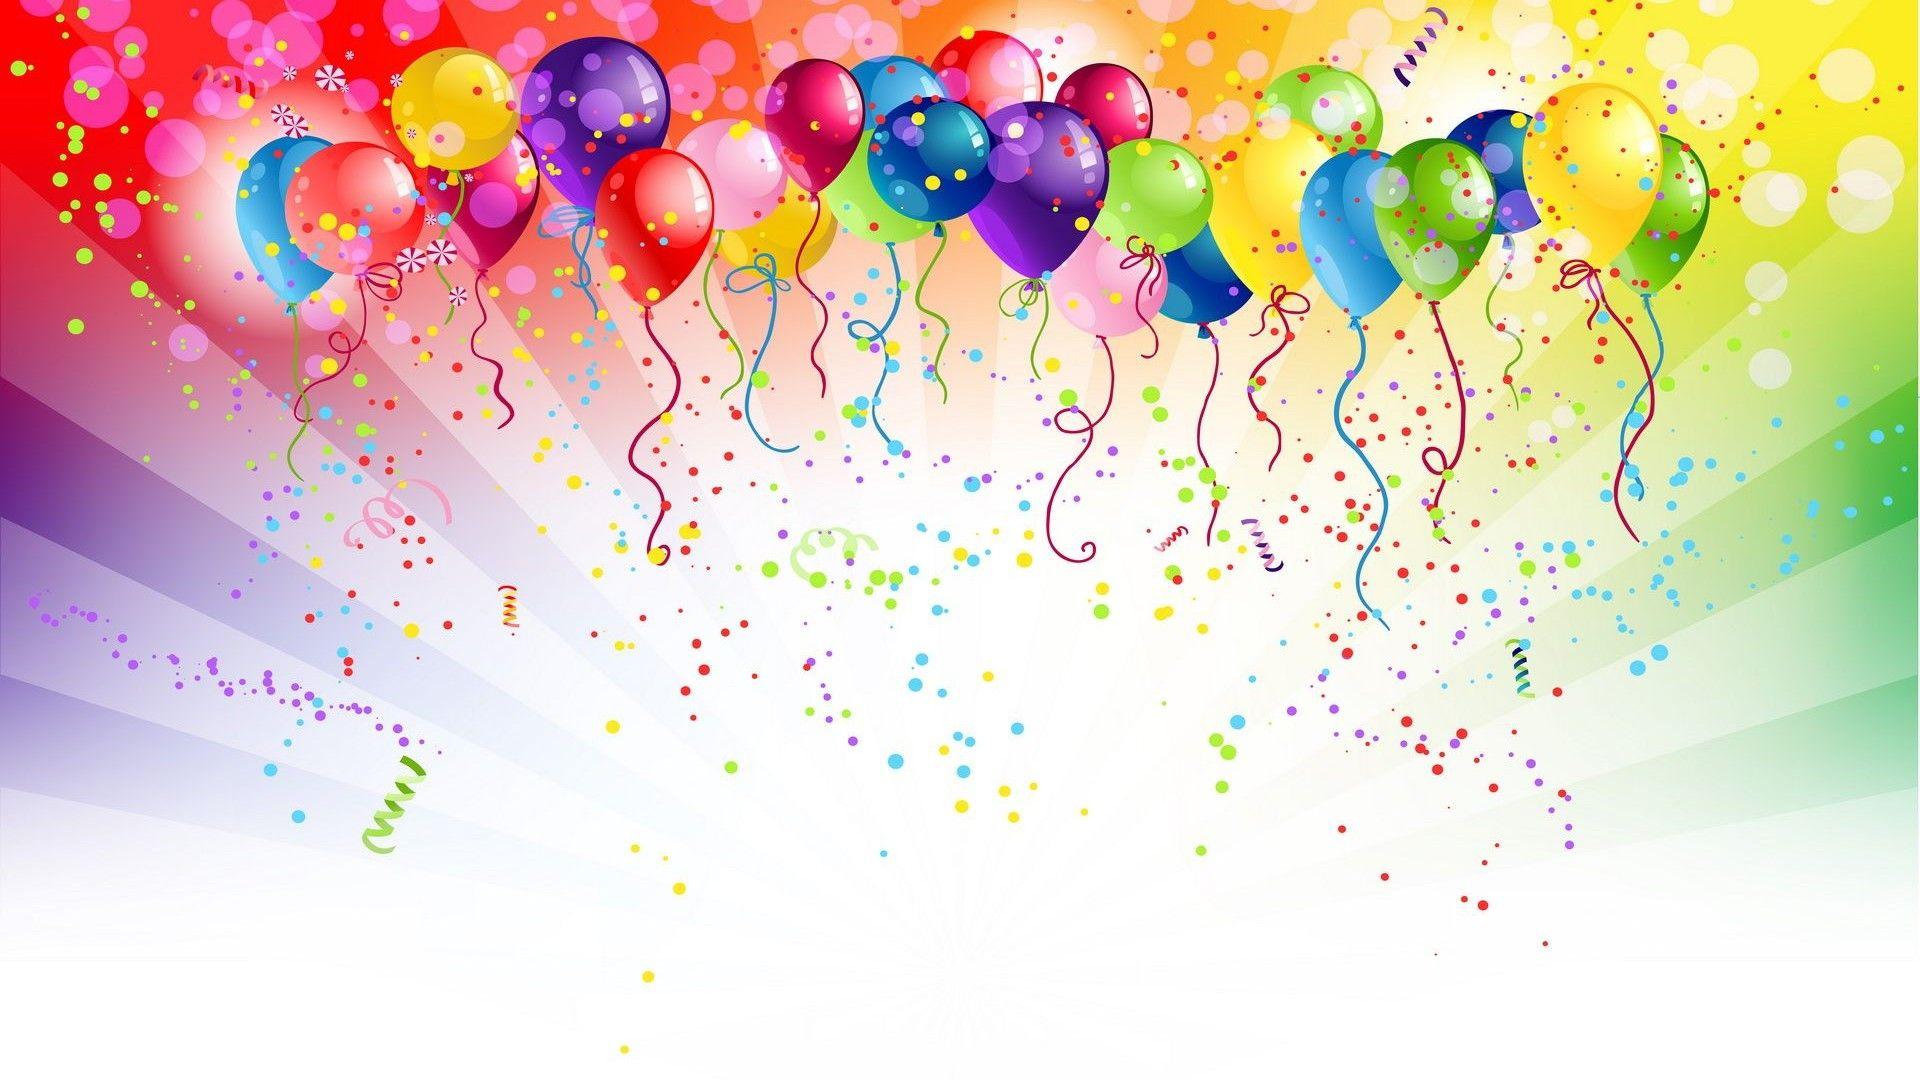 Happy Birthday Balloons Wallpaper Hd For Desktop Amp Mobile